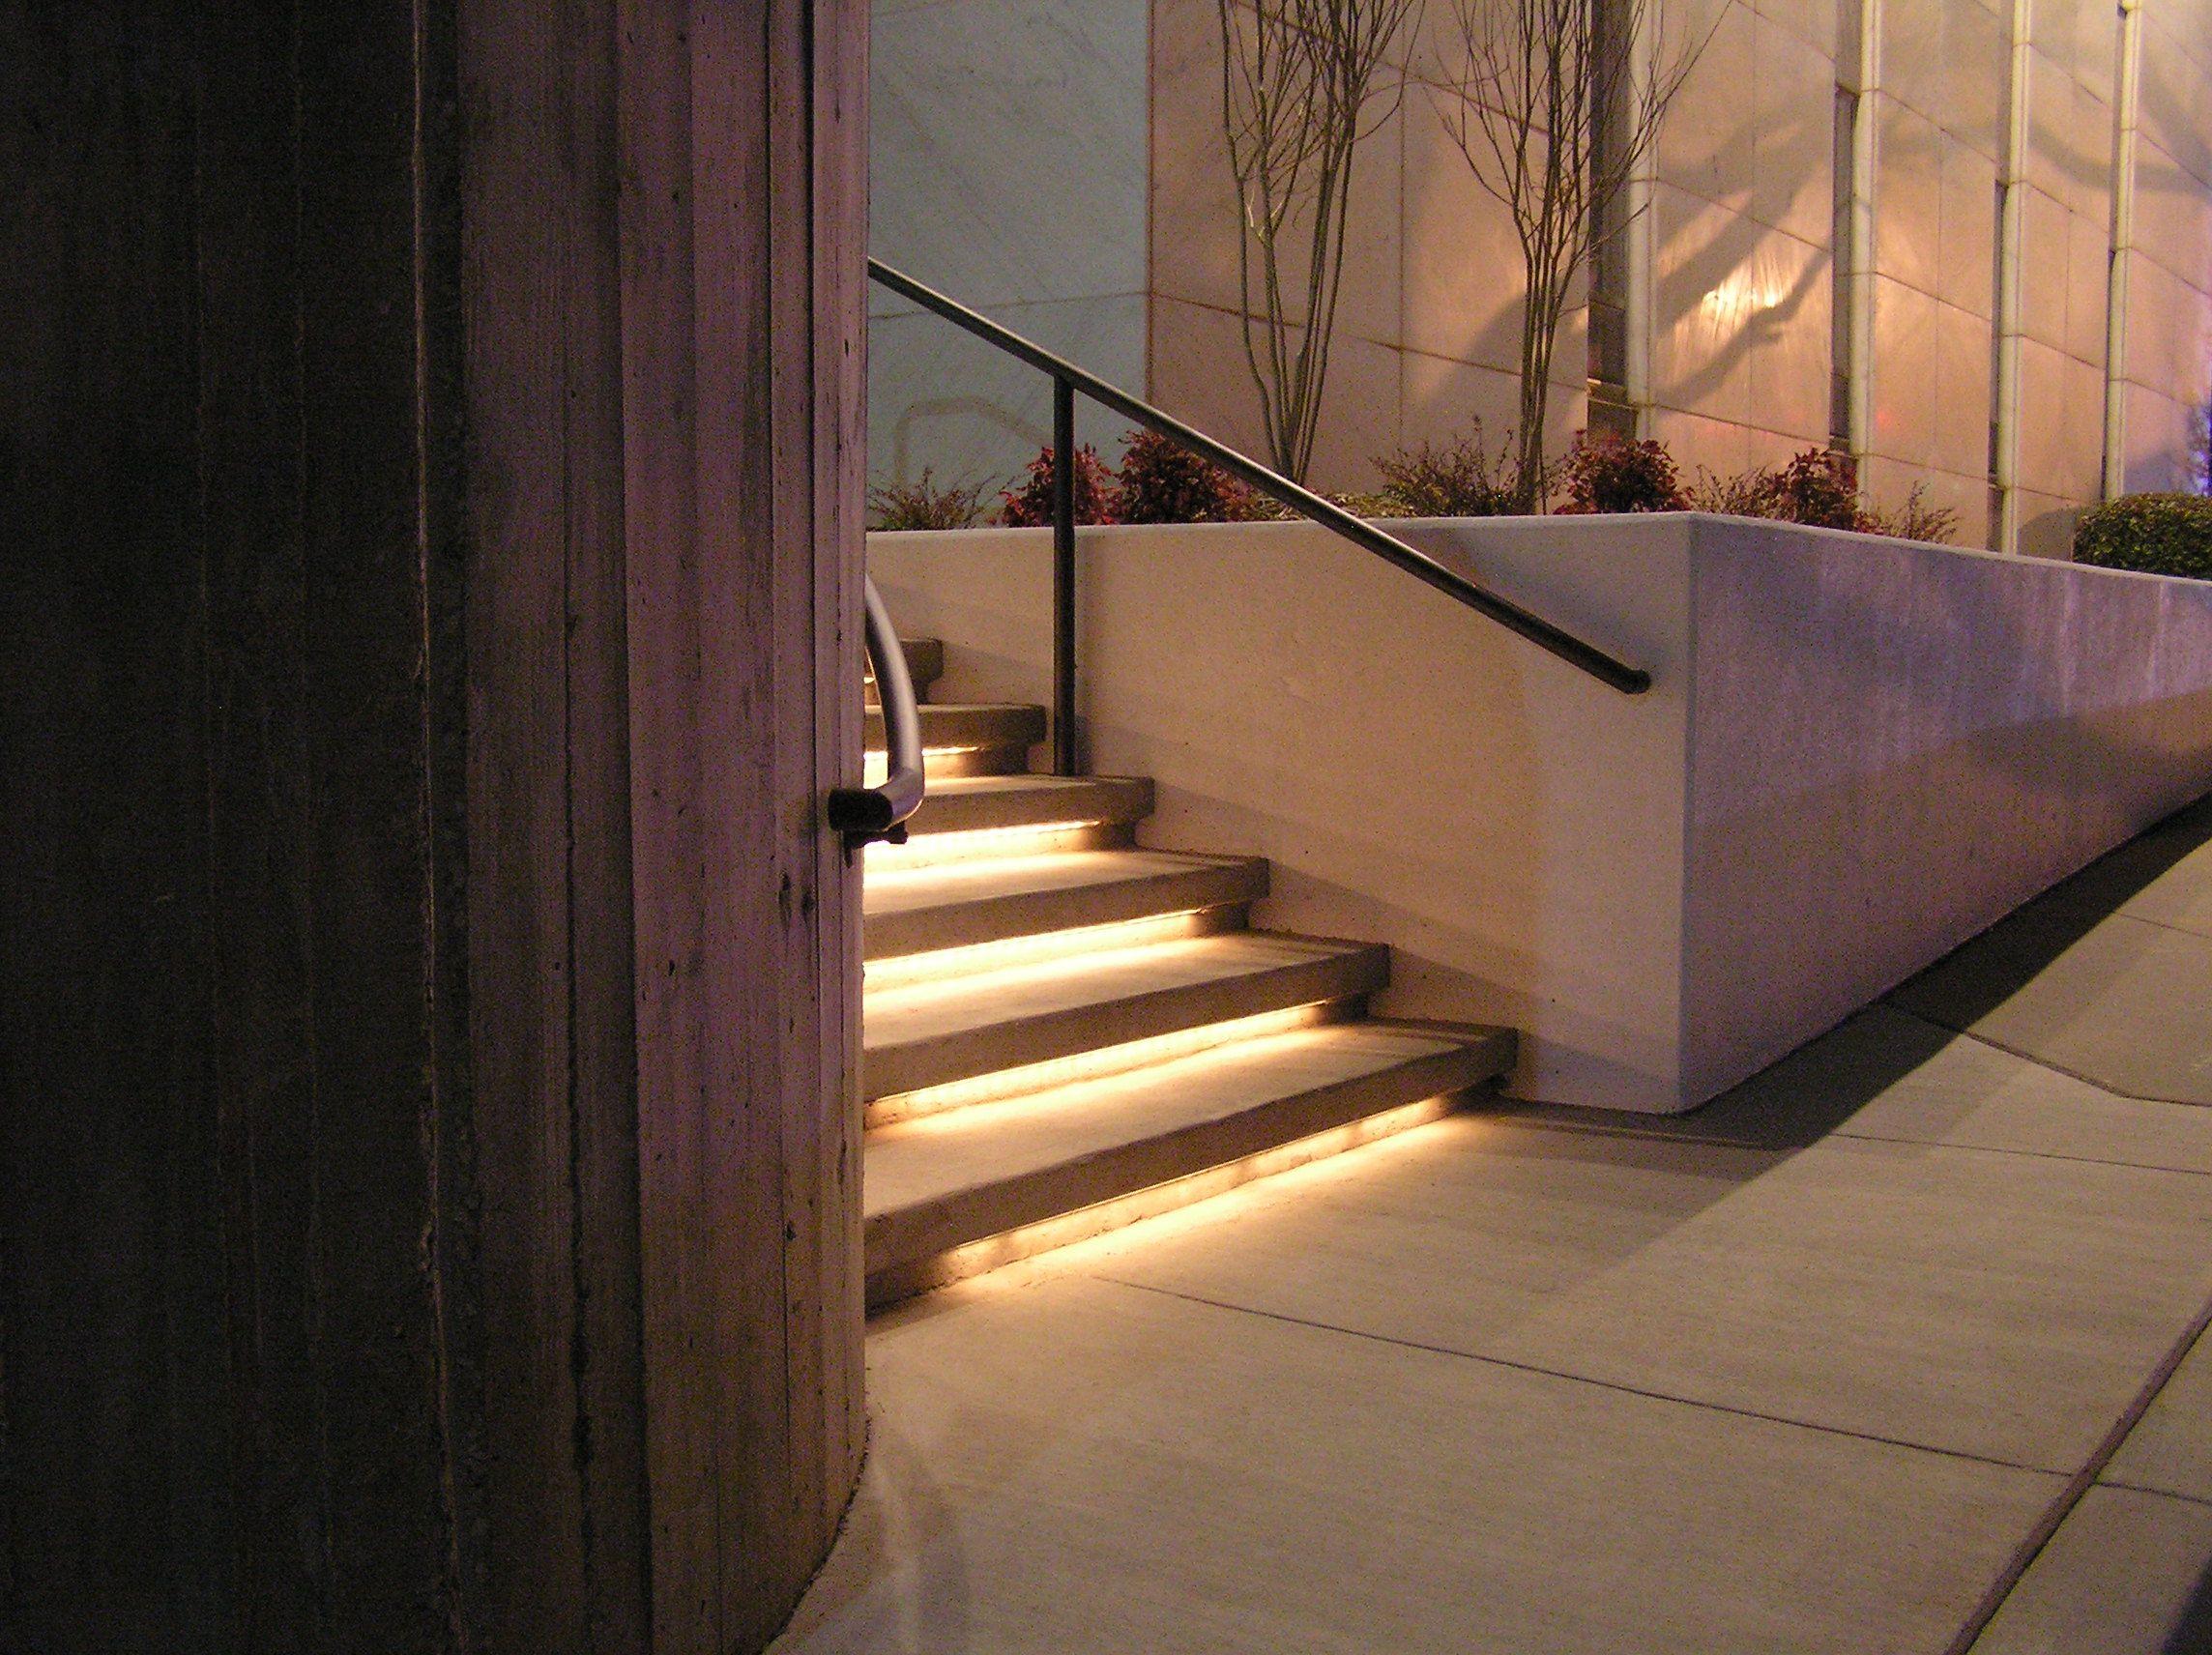 stairway to heaven a step light primer step lighting indoor exterior pinterest stairways. Black Bedroom Furniture Sets. Home Design Ideas